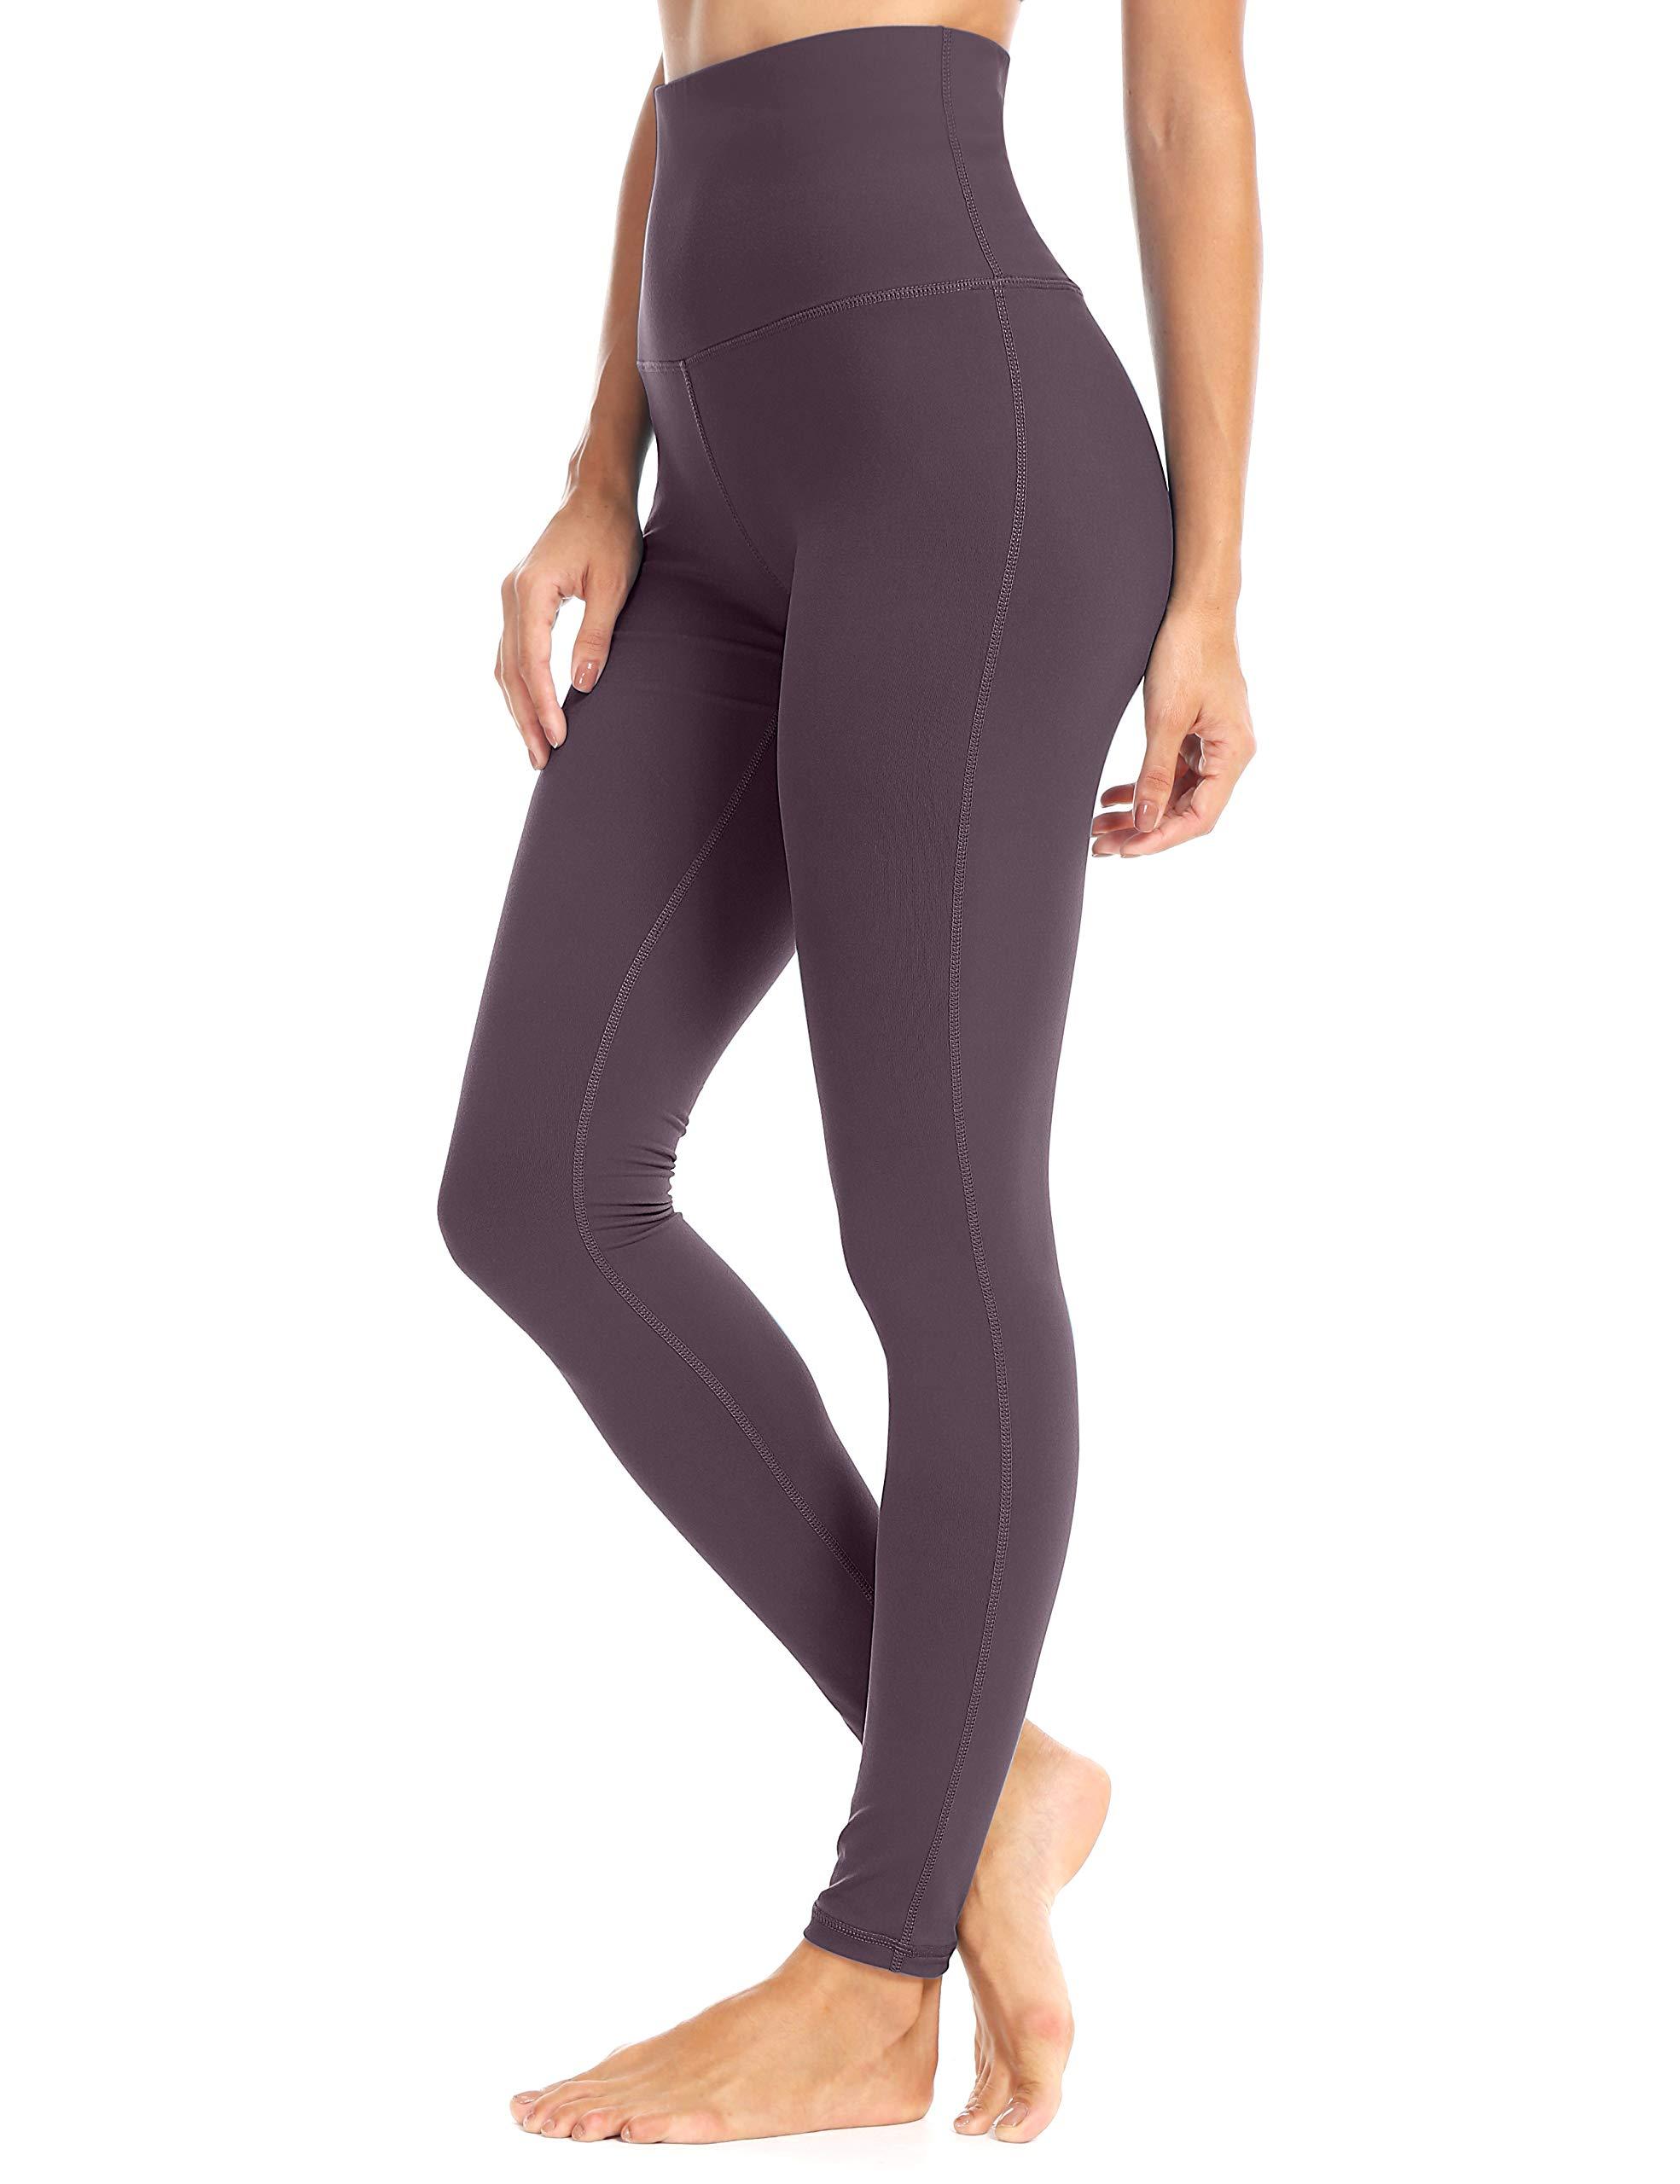 9ca41355371 QUEENIEKE Women Yoga Legging Power Flex High Waist Running Pants Workout  Tights product image